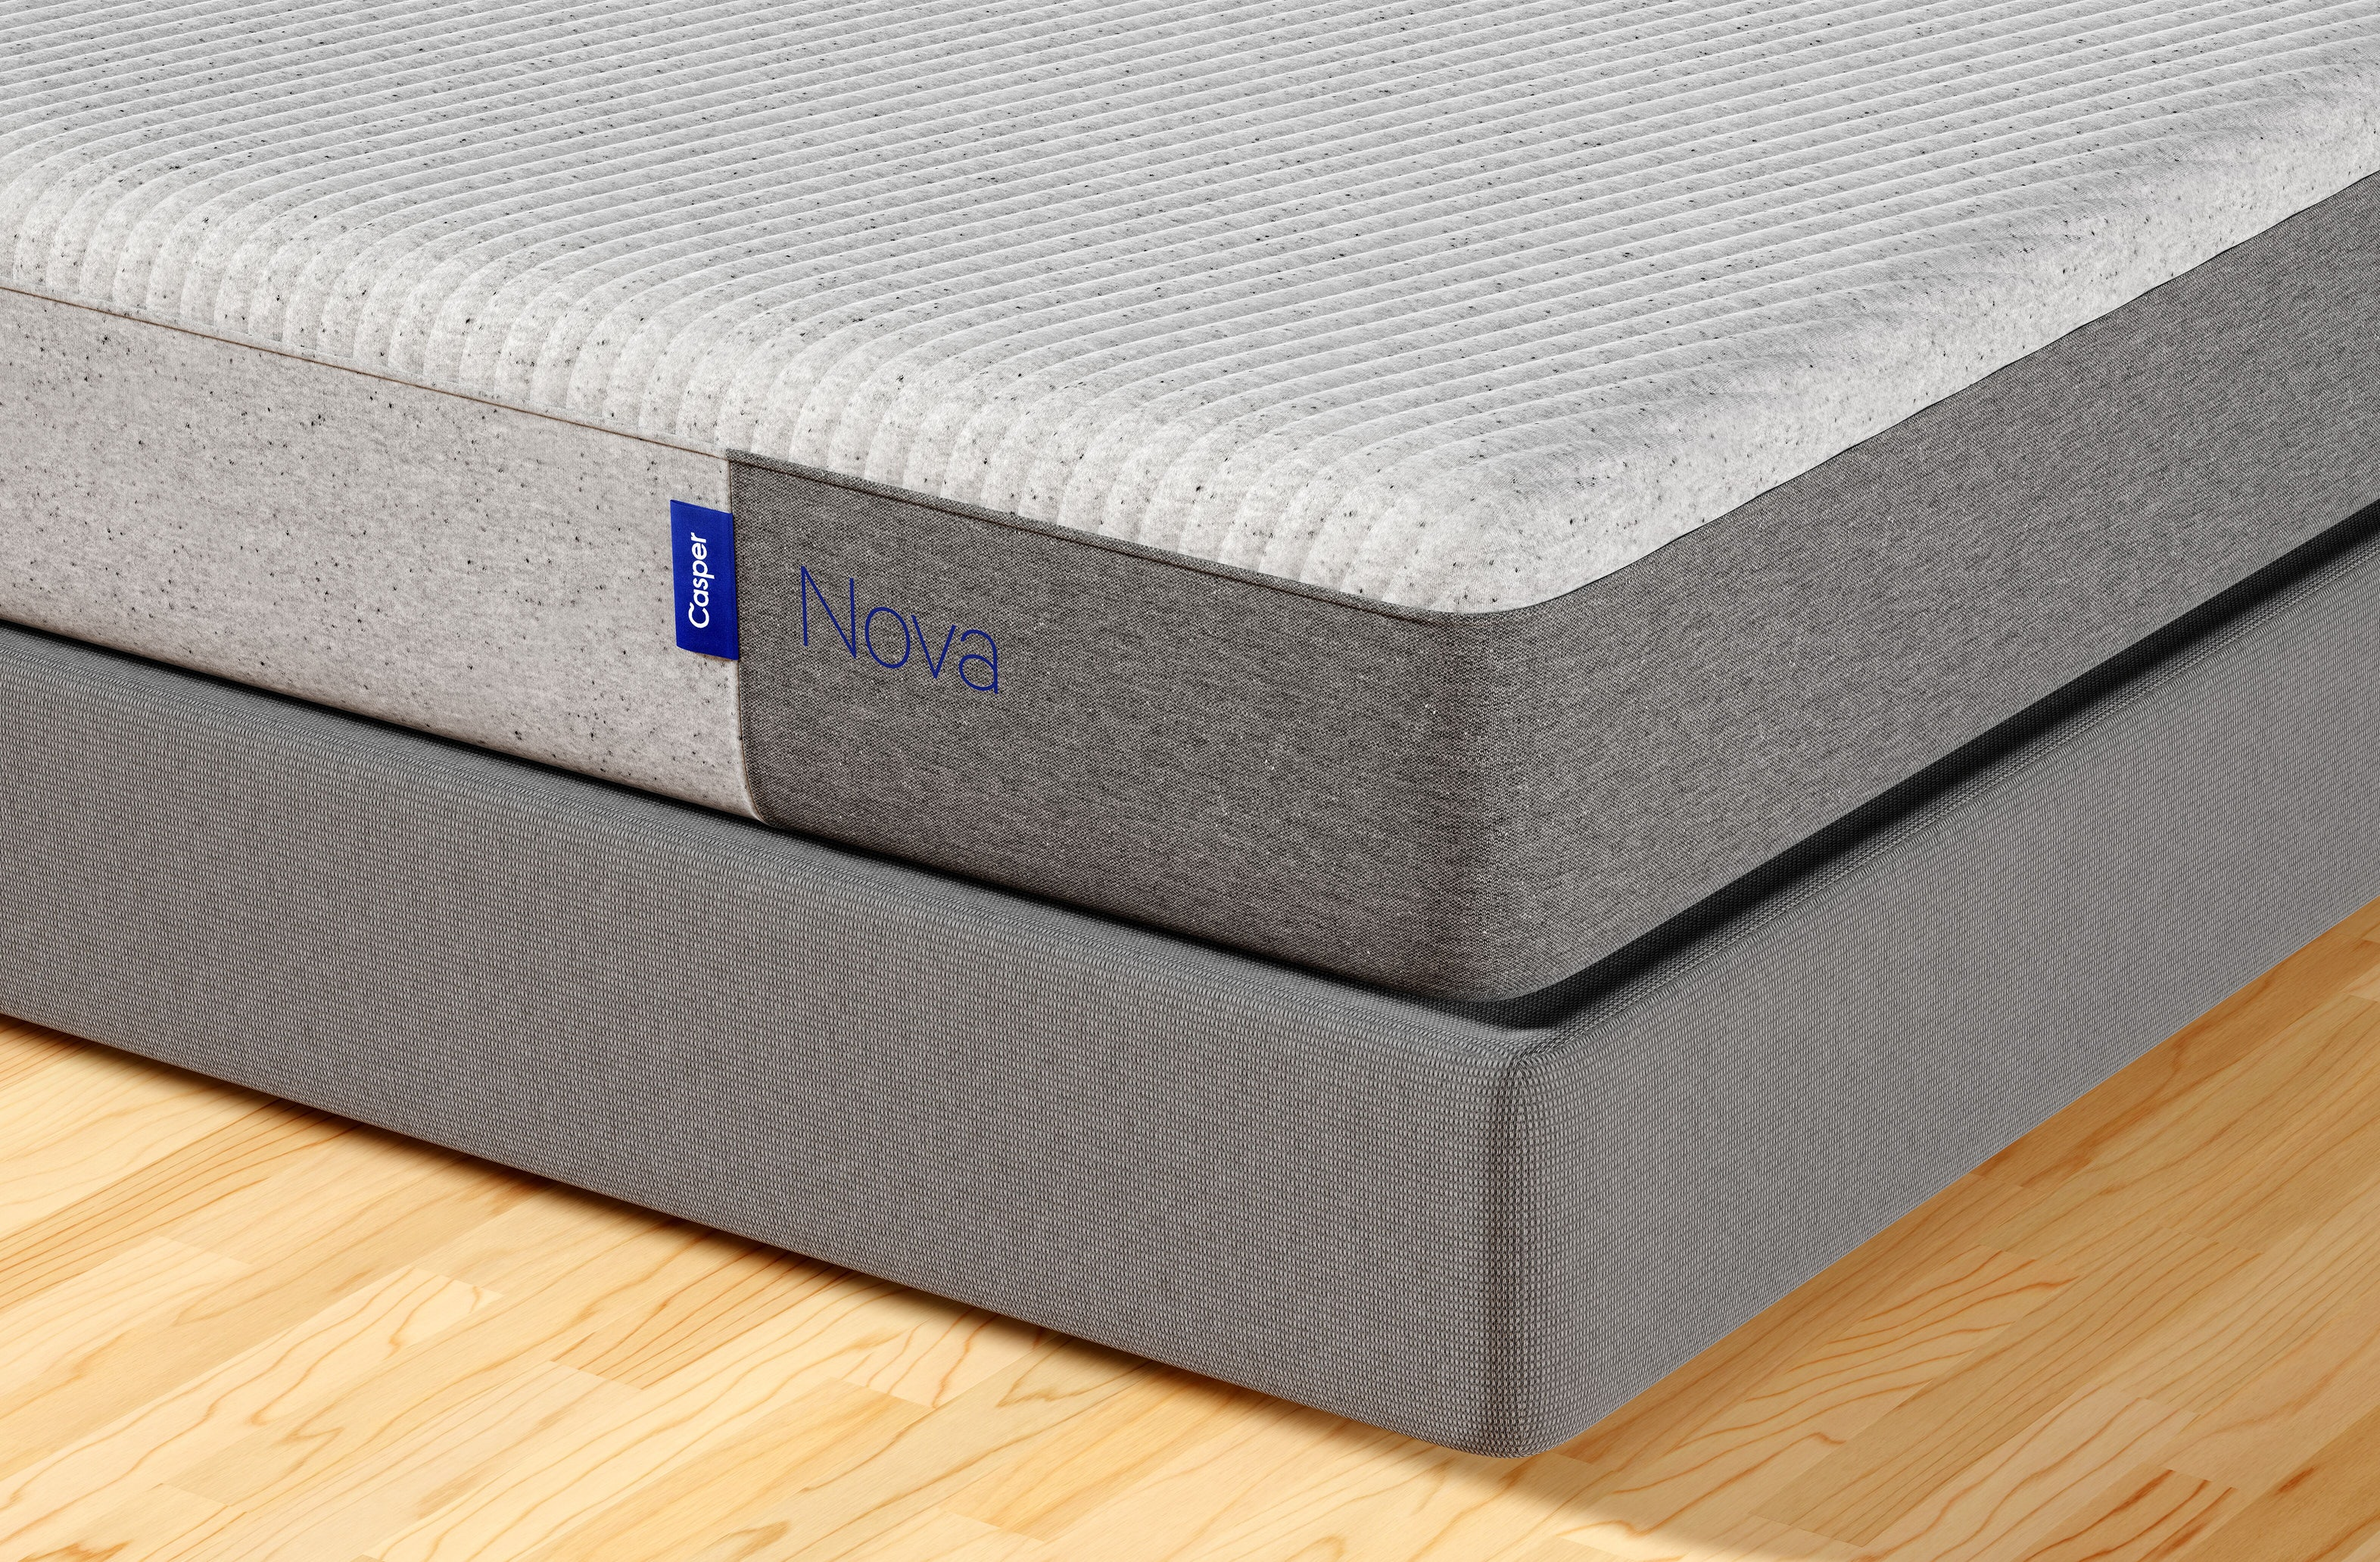 Corner of Casper Nova Foam mattress